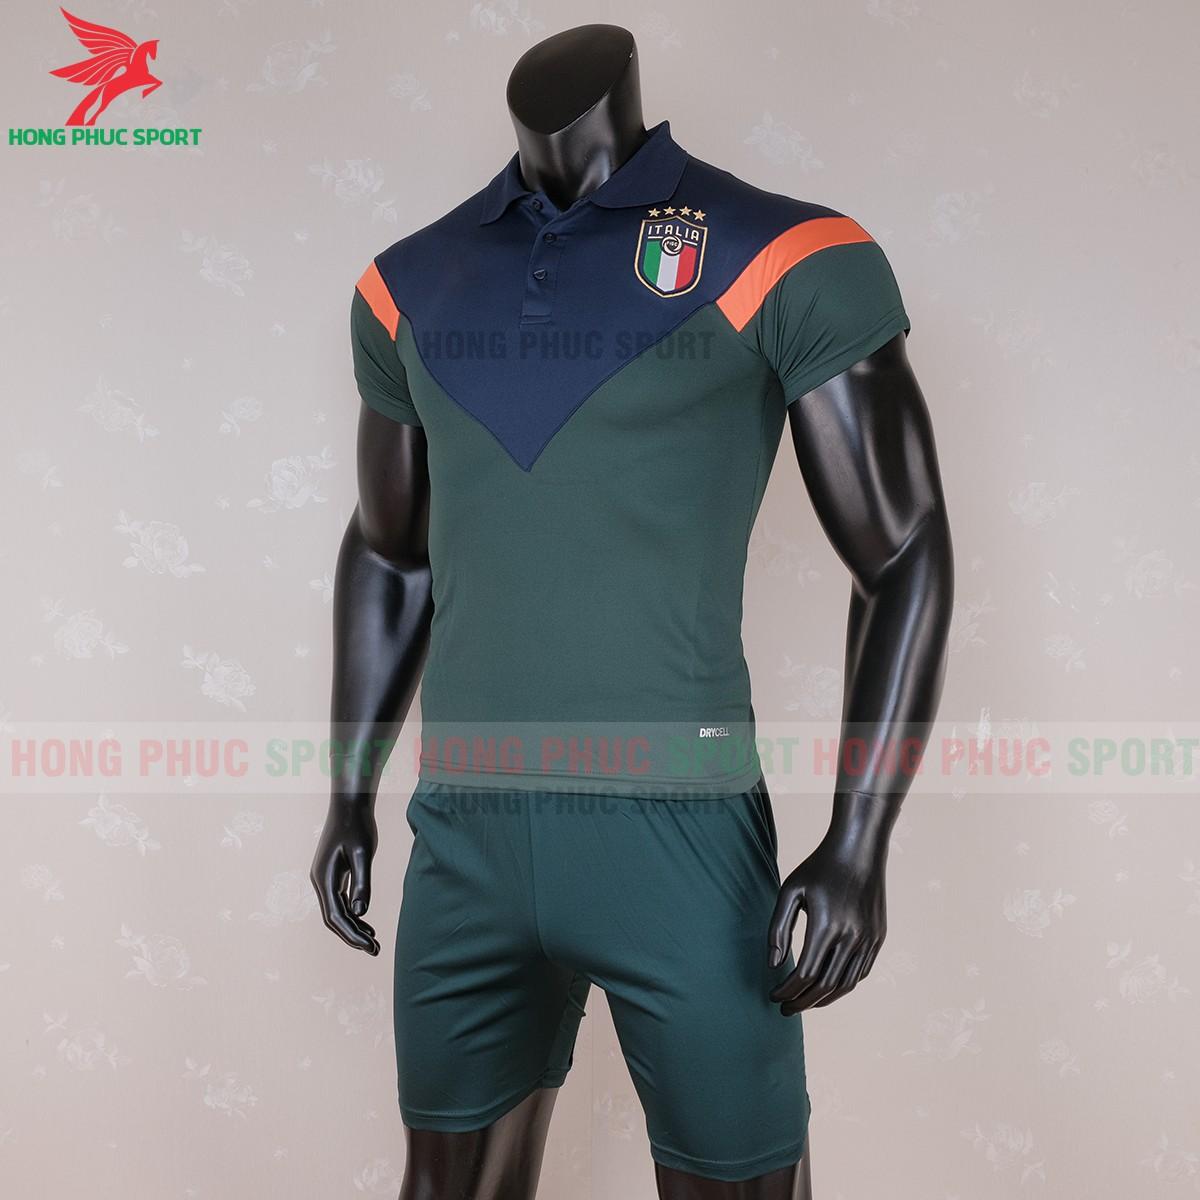 https://cdn.hongphucsport.com/unsafe/s4.shopbay.vn/files/285/ao-polo-tuyen-italia-2020-3-5f73e3b412bd7.png